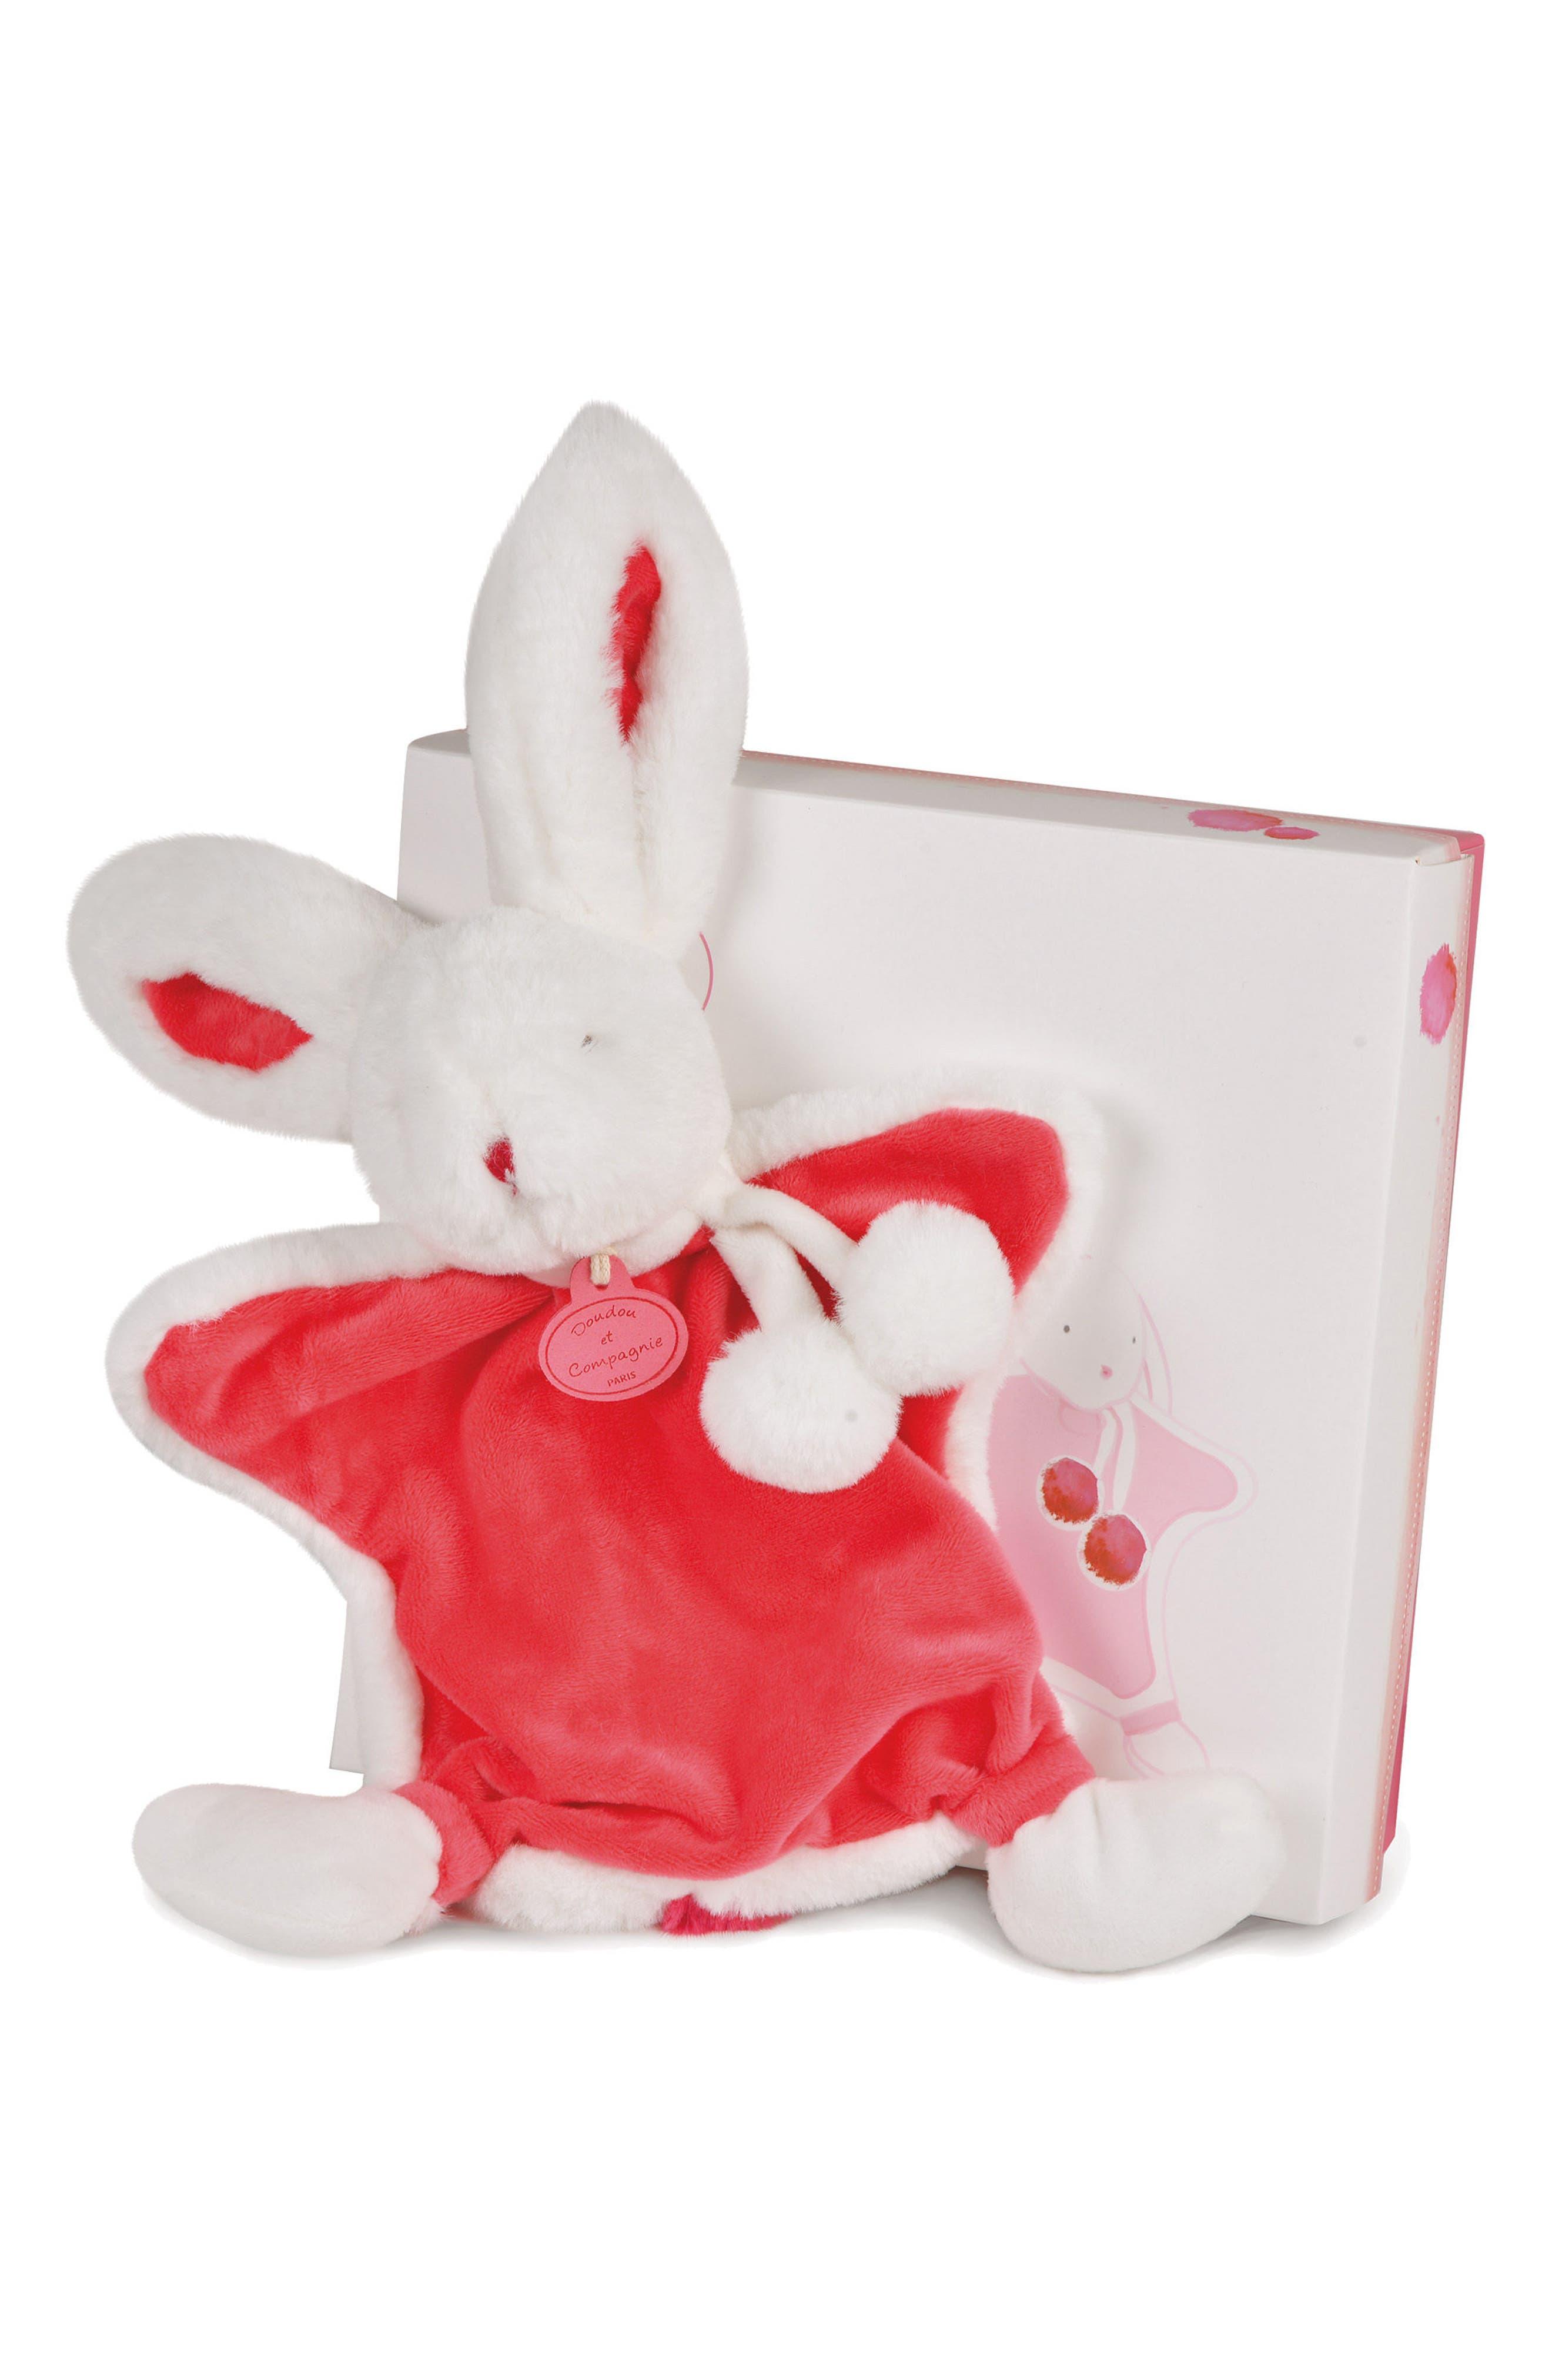 Strawberry Pink Bunny Rattle & Lovie Blanket Gift Set,                             Alternate thumbnail 3, color,                             Strawberry Pink